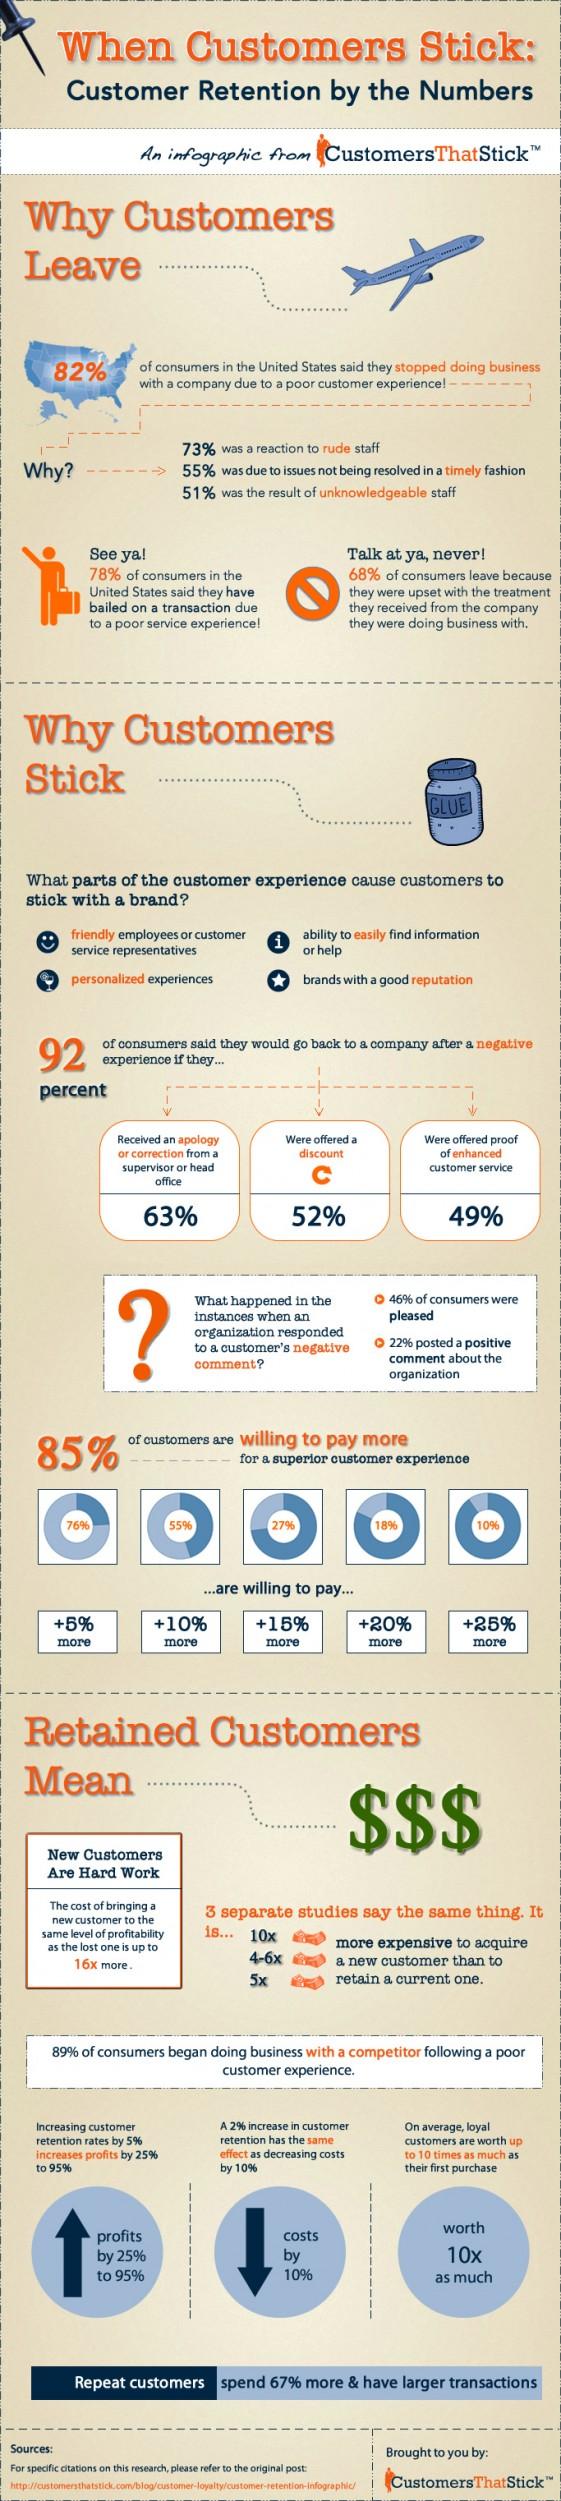 when-customers-stick_customer-retention